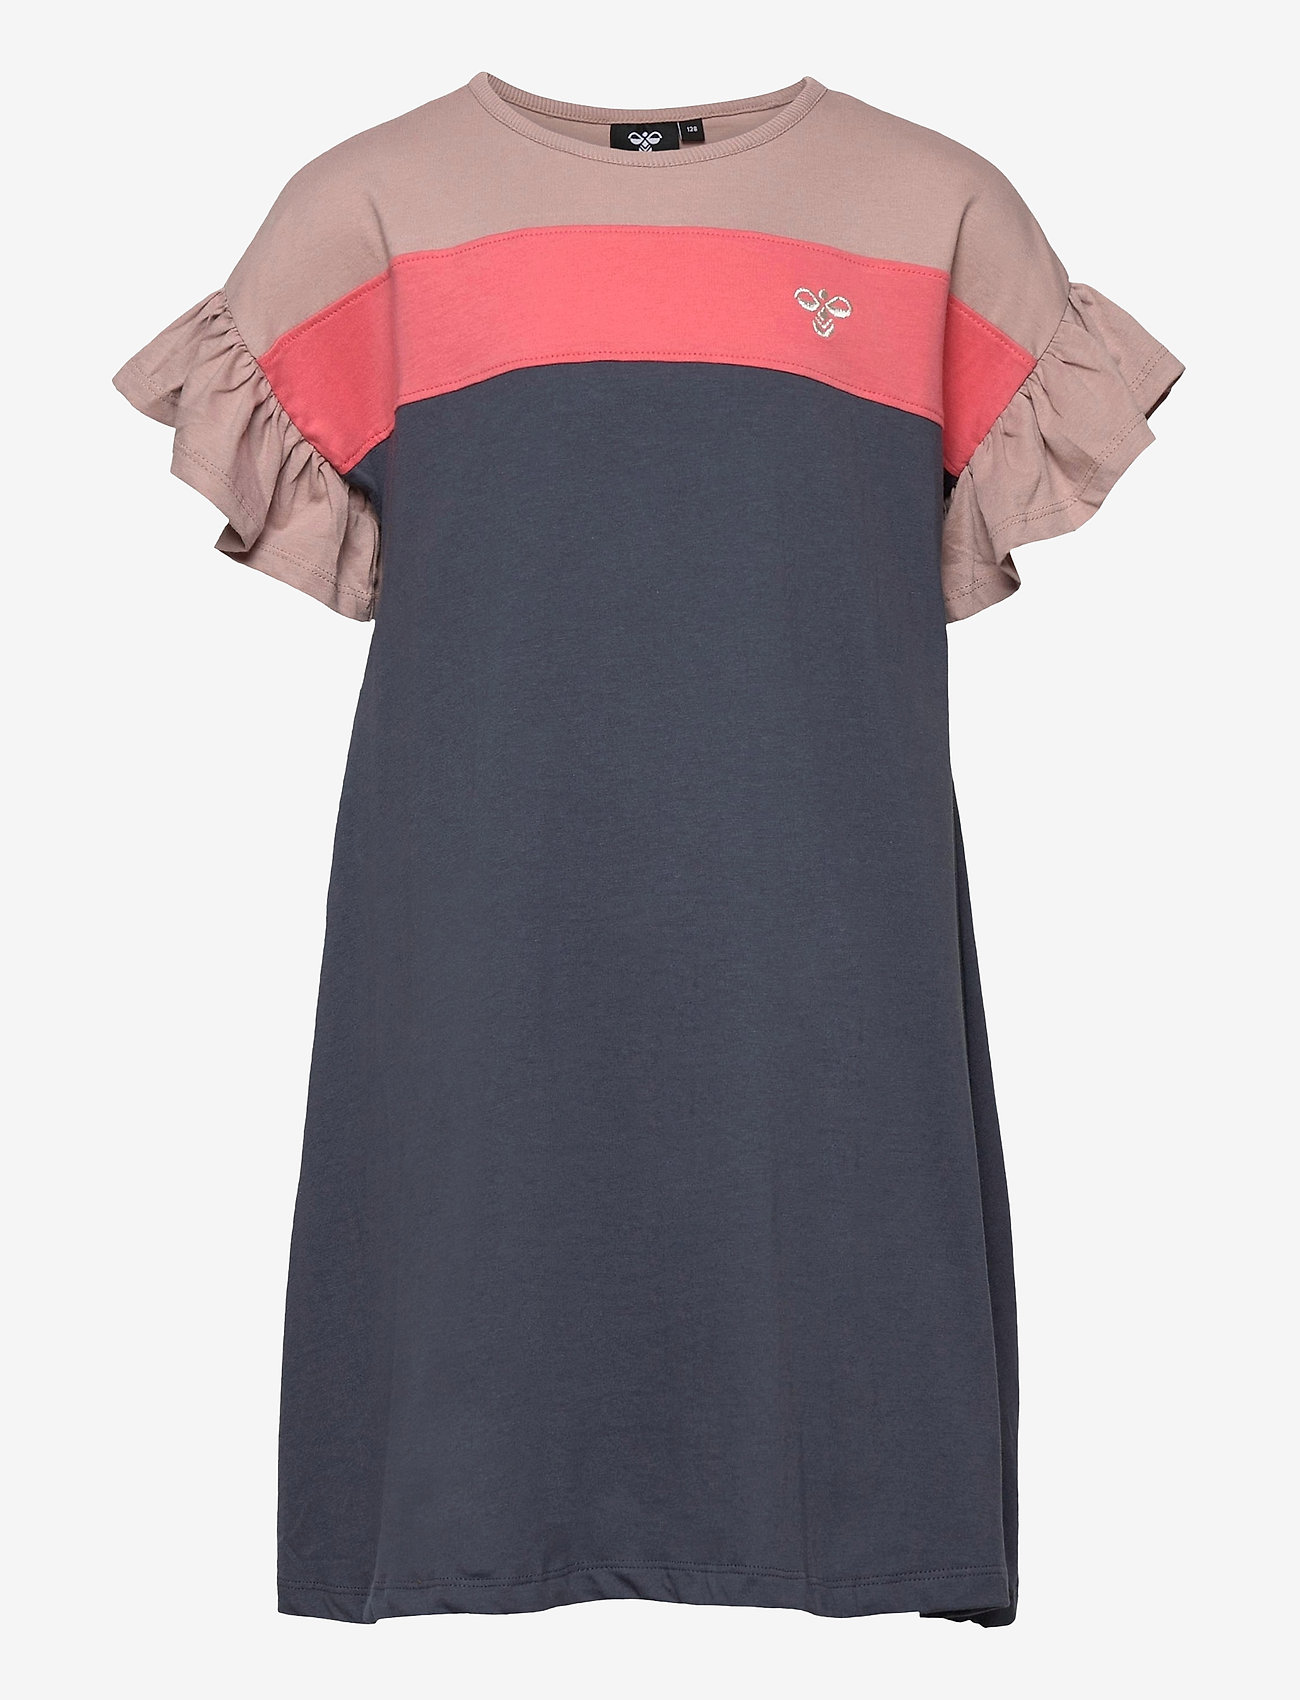 Hummel - hmlANNA DRESS S/S - kleider - ombre blue - 0